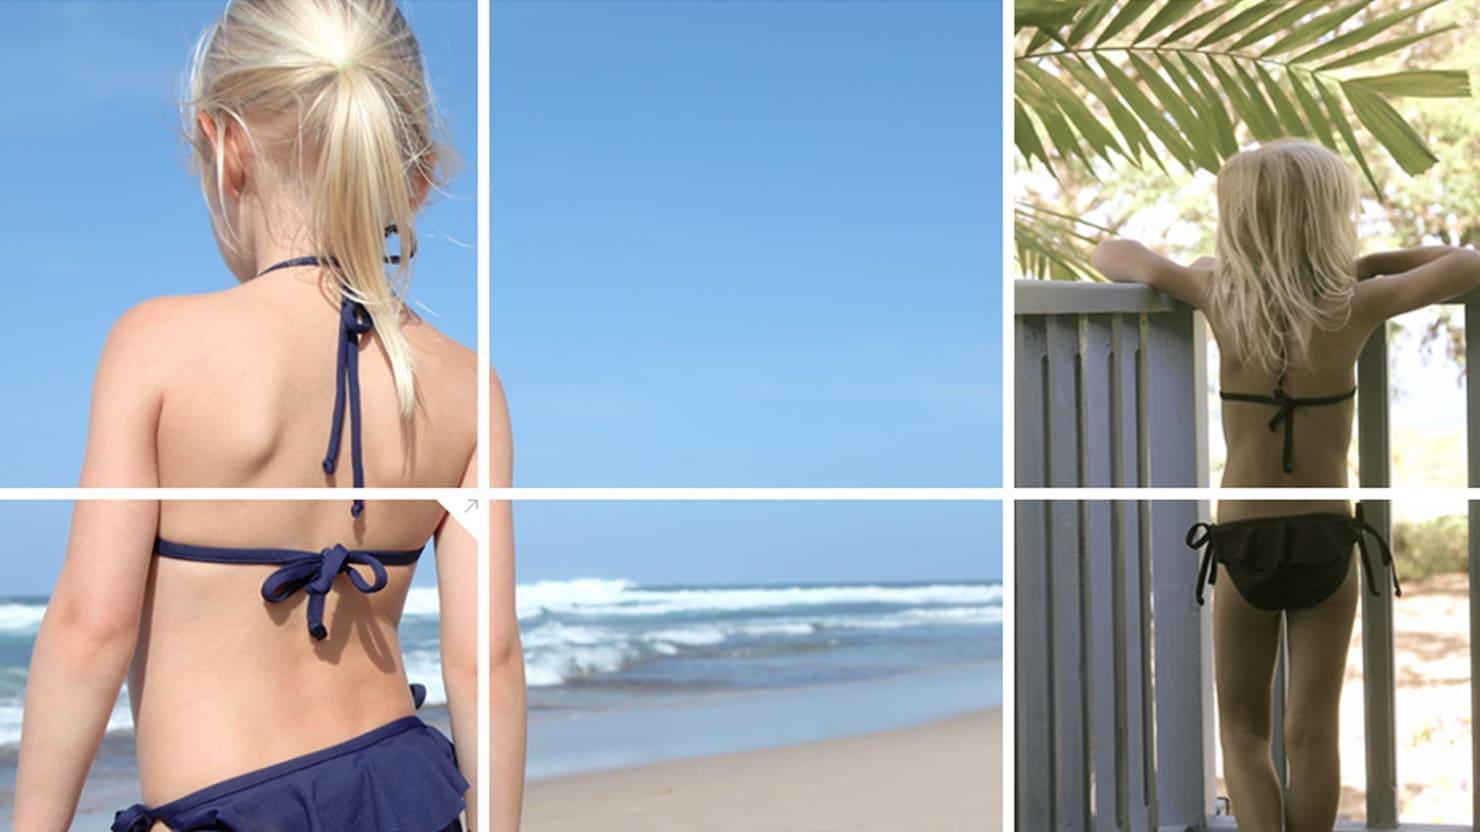 Little girls bikini controversy